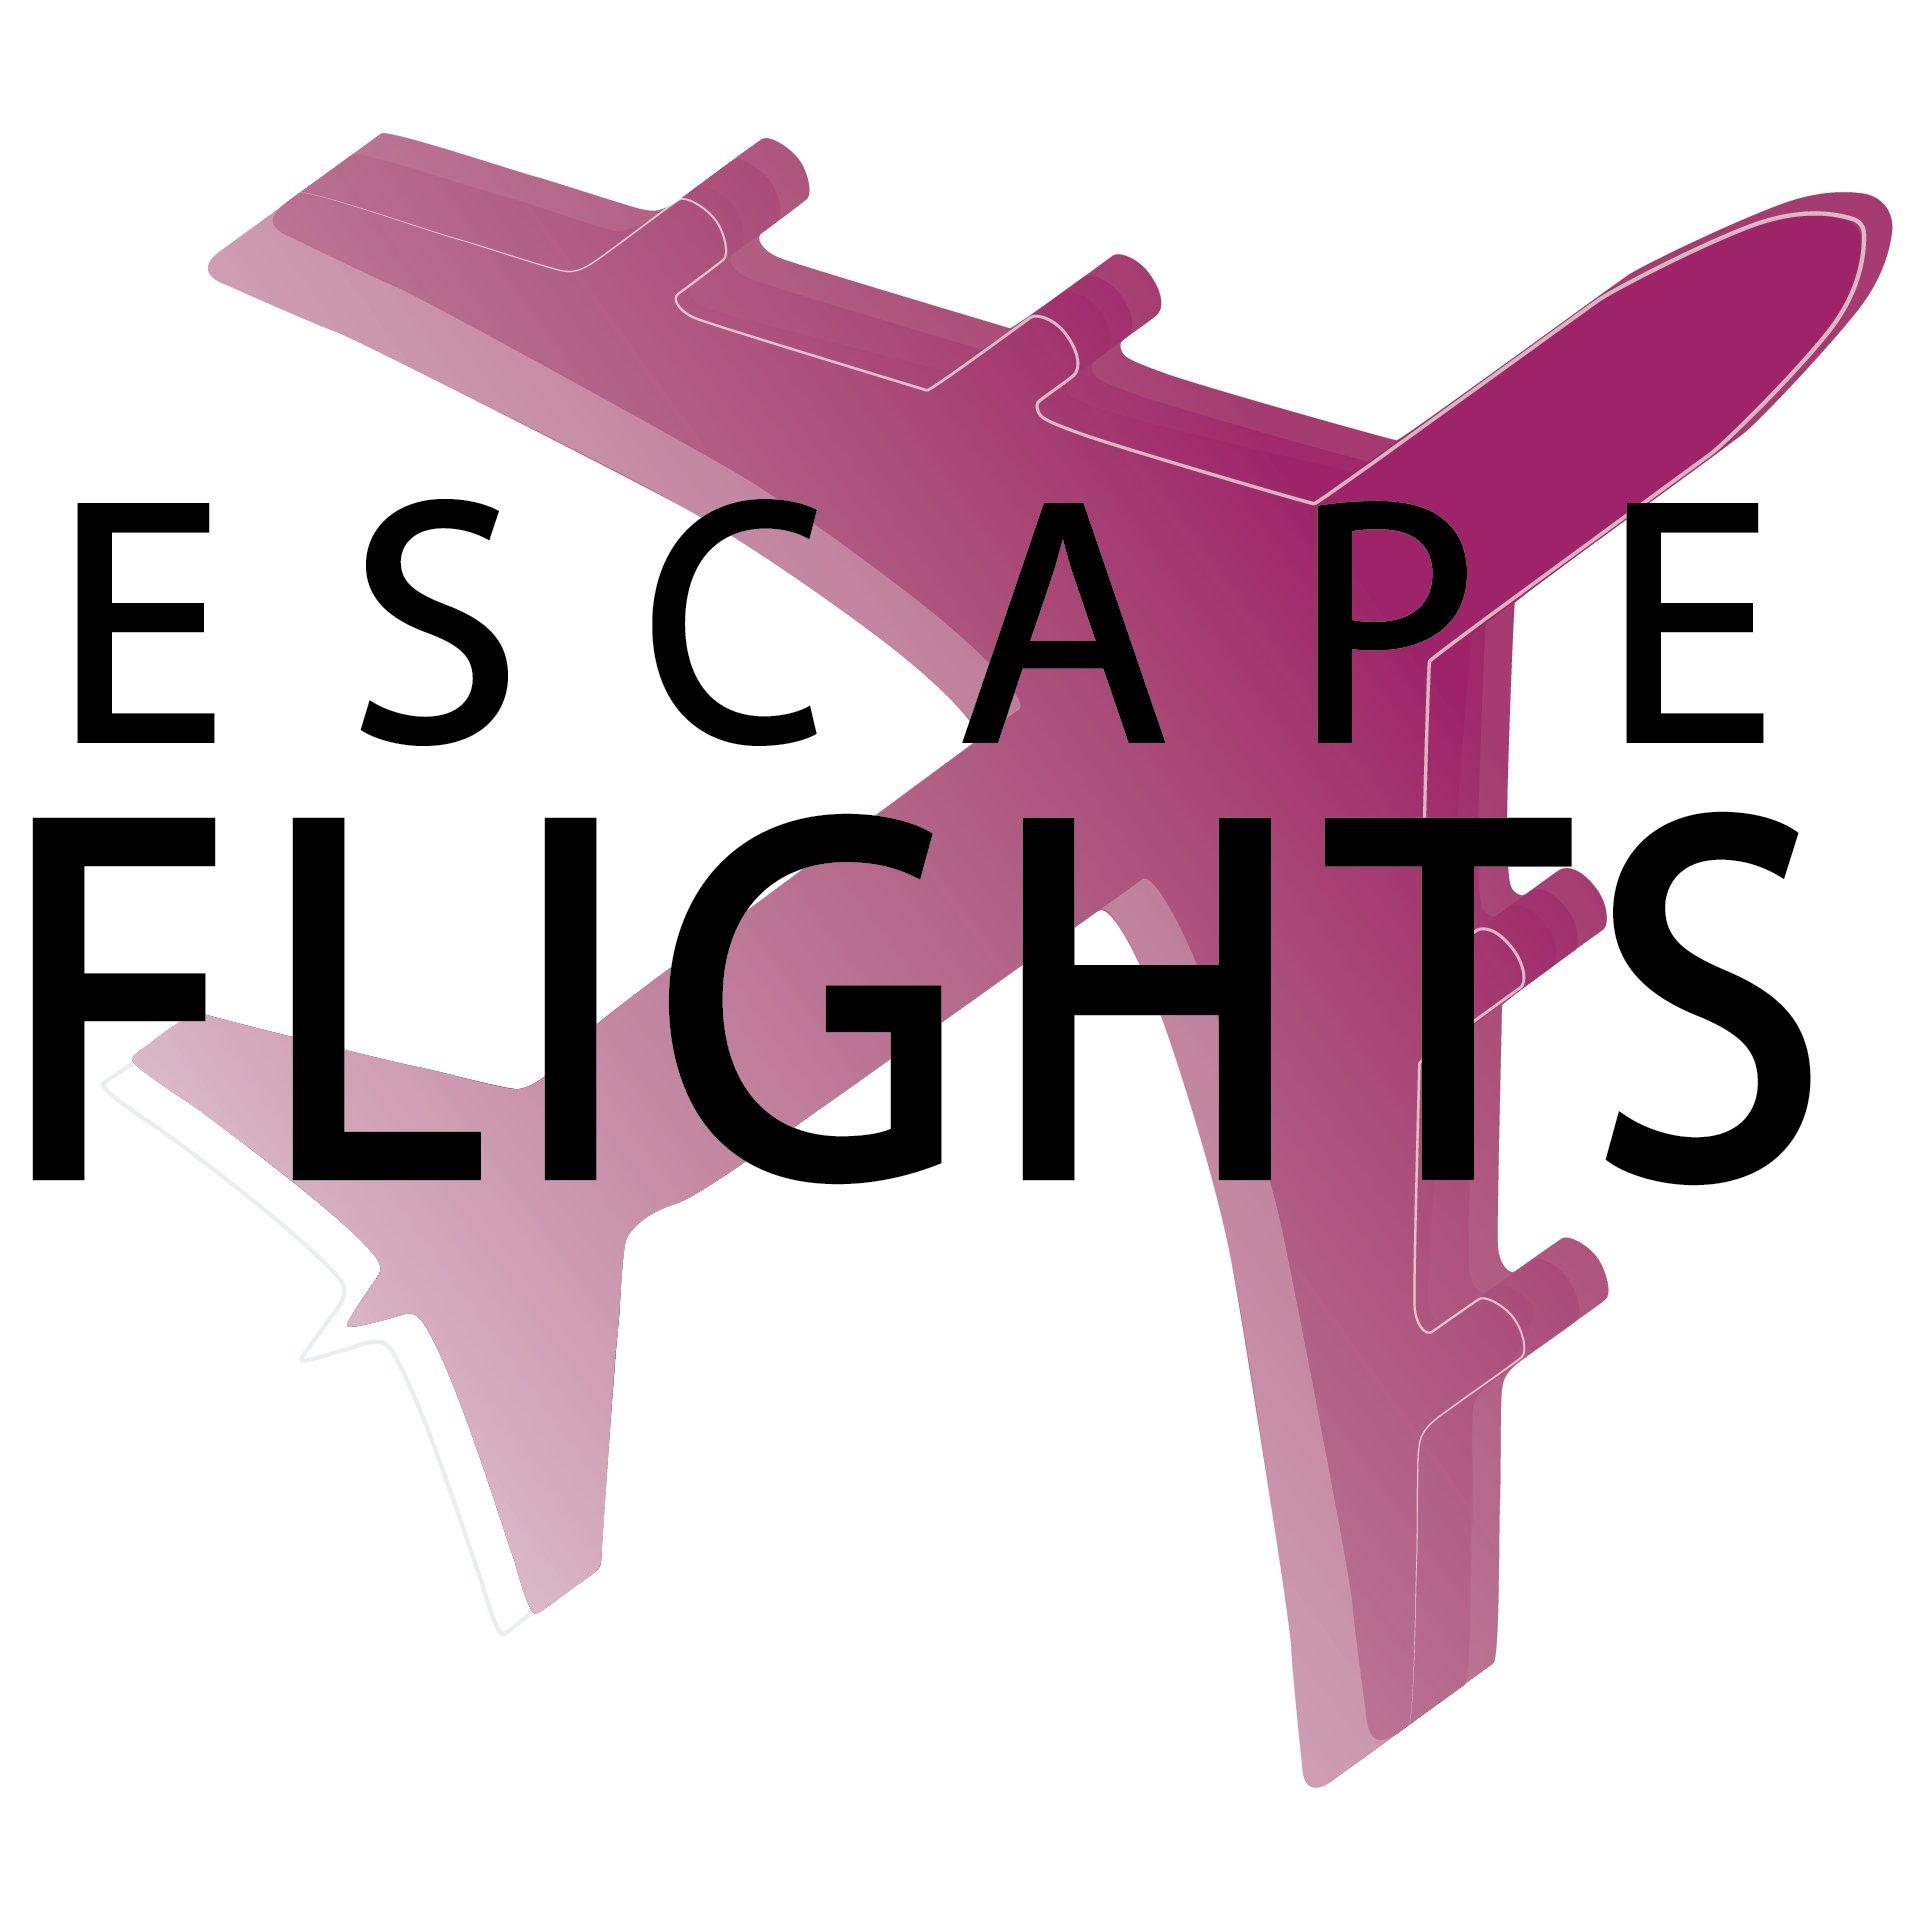 Escape Flights - LAX